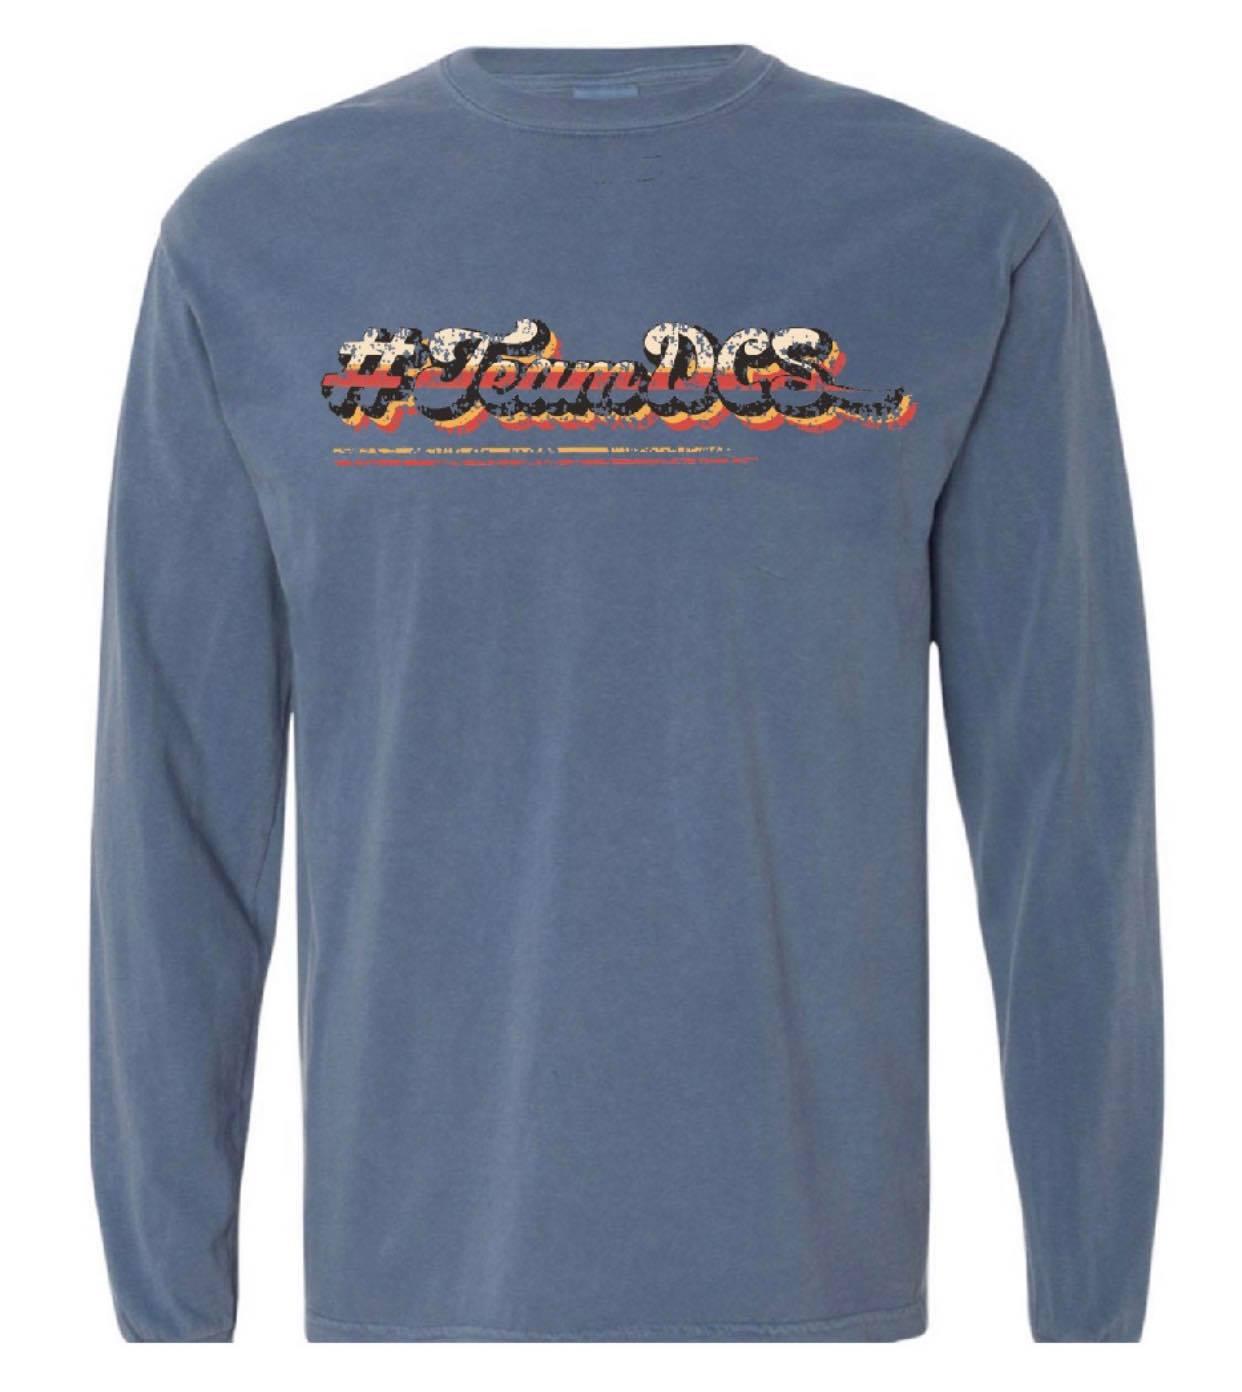 Image of #TeamDCS Vintage Shirt - LONG Sleeve Comfort Color